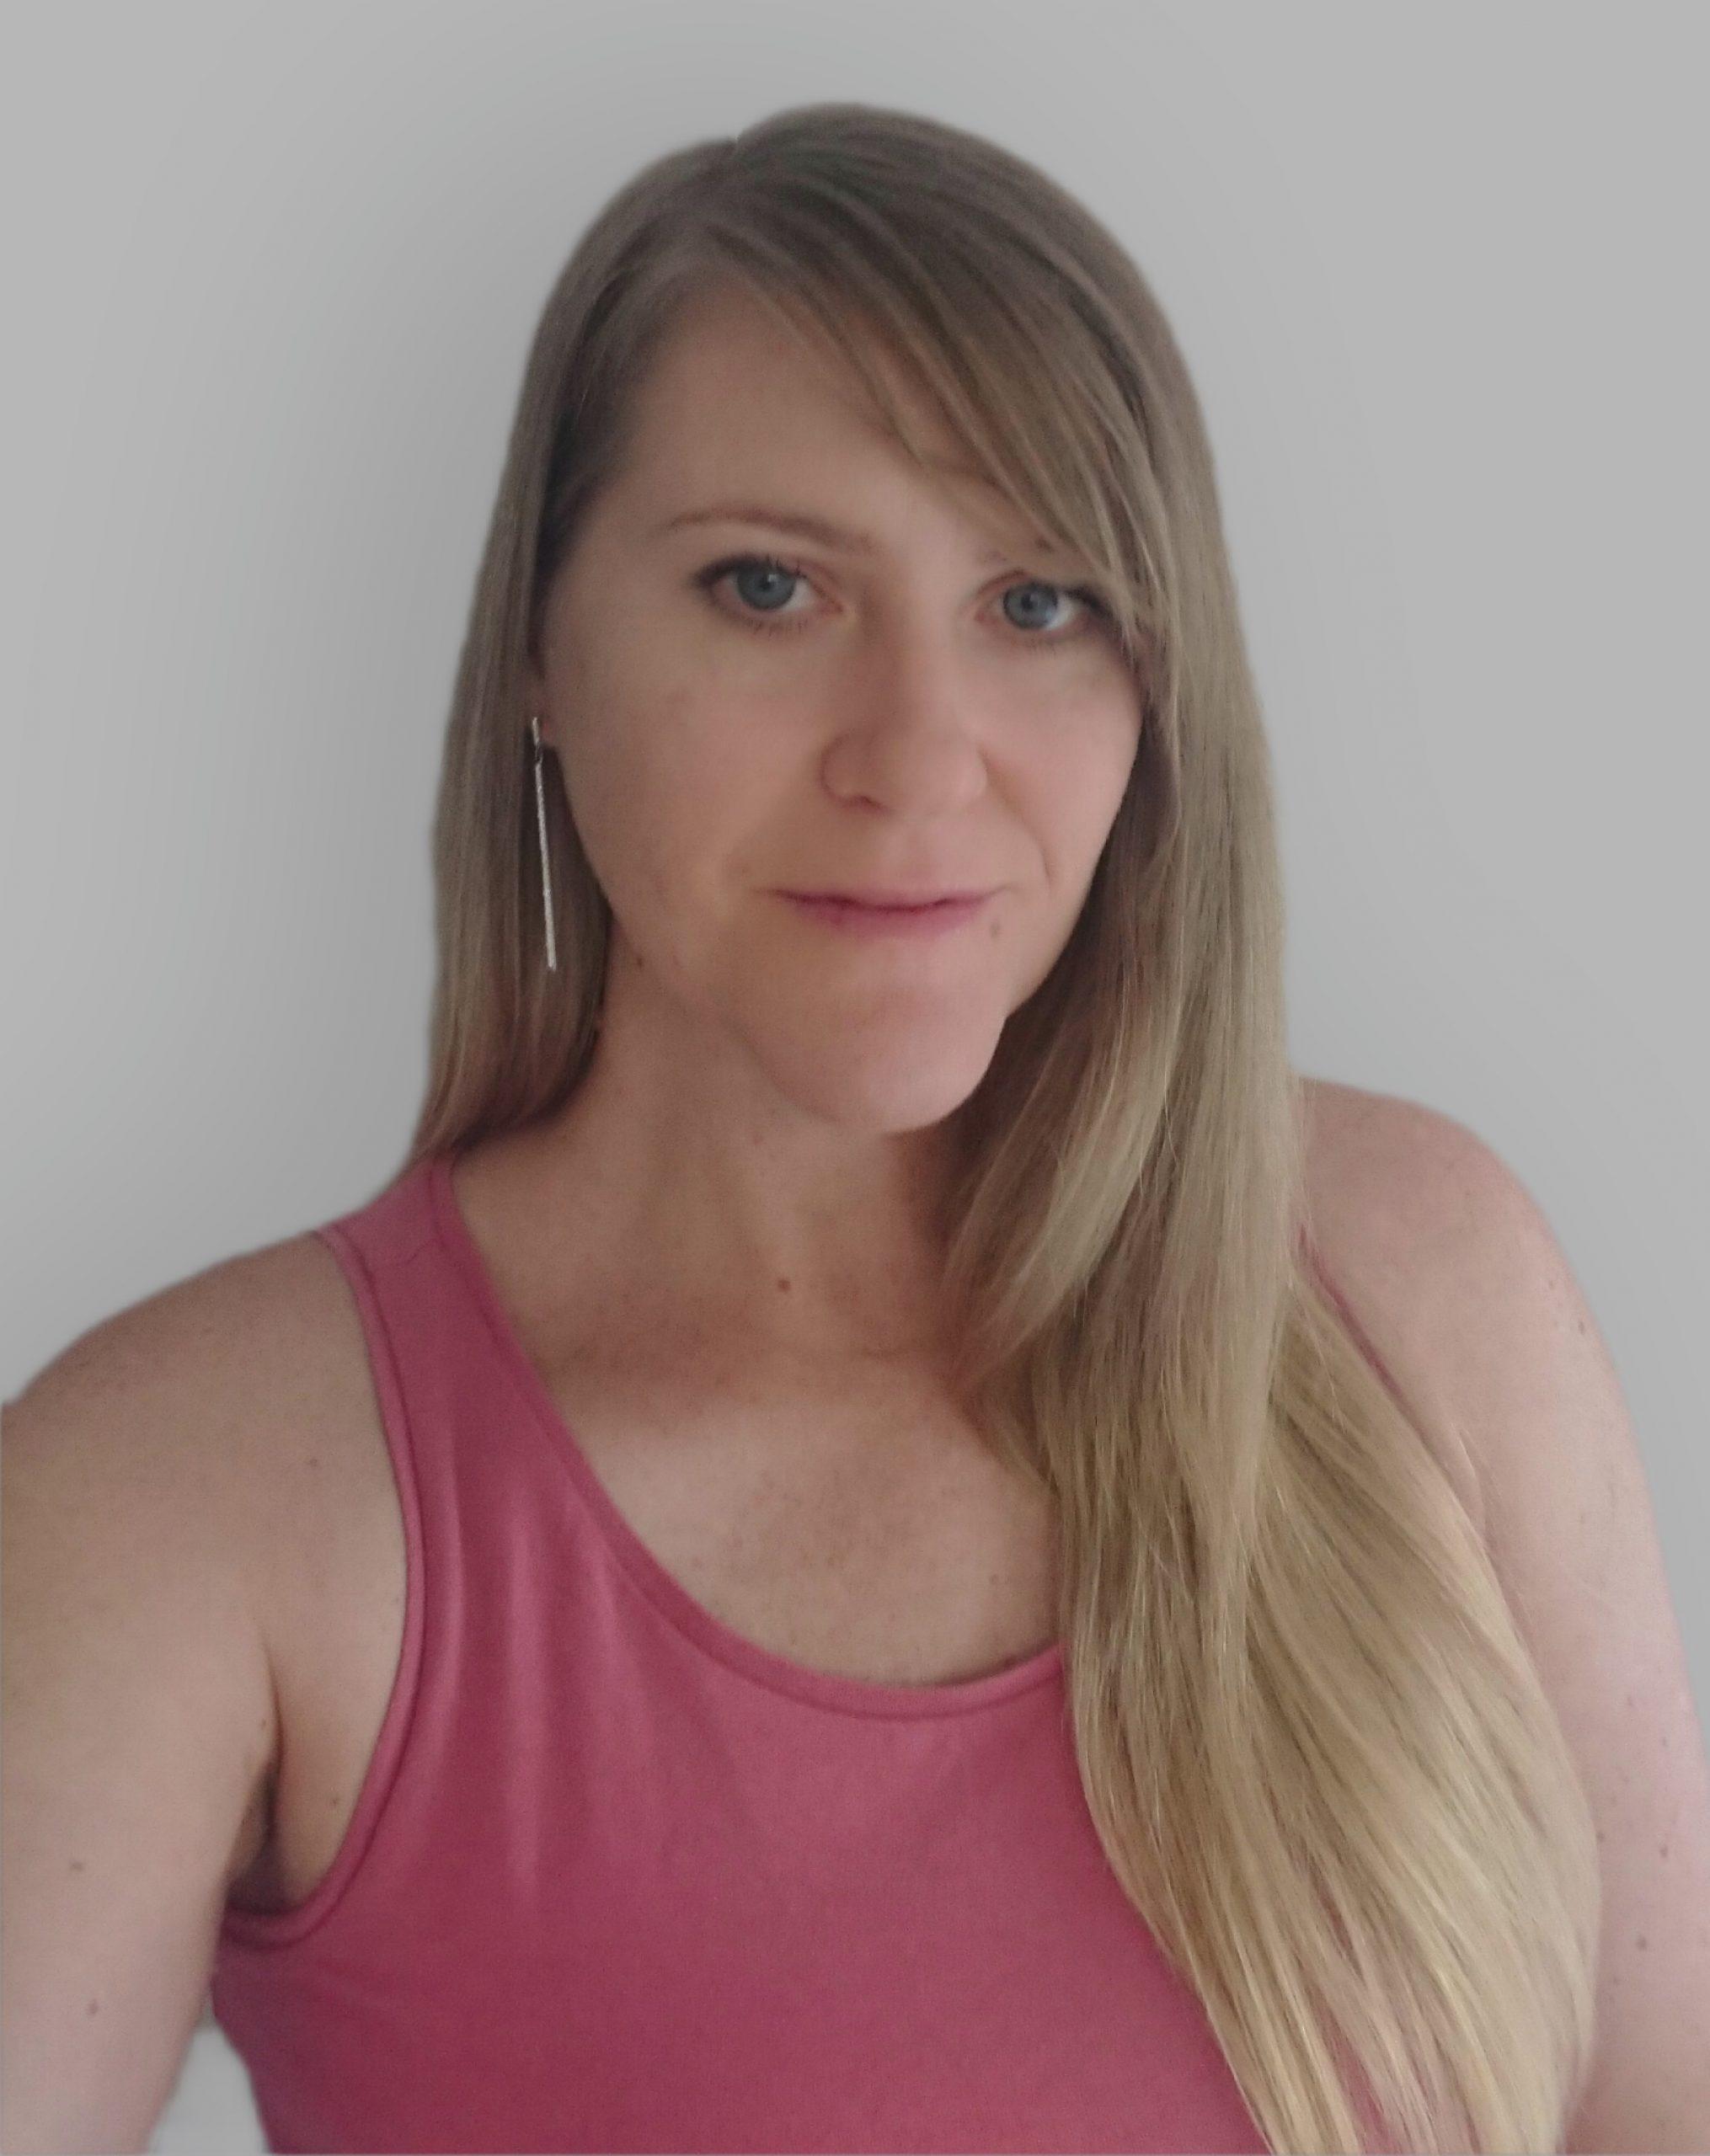 Carmen Atkinson, Gosford, NSW, ORS